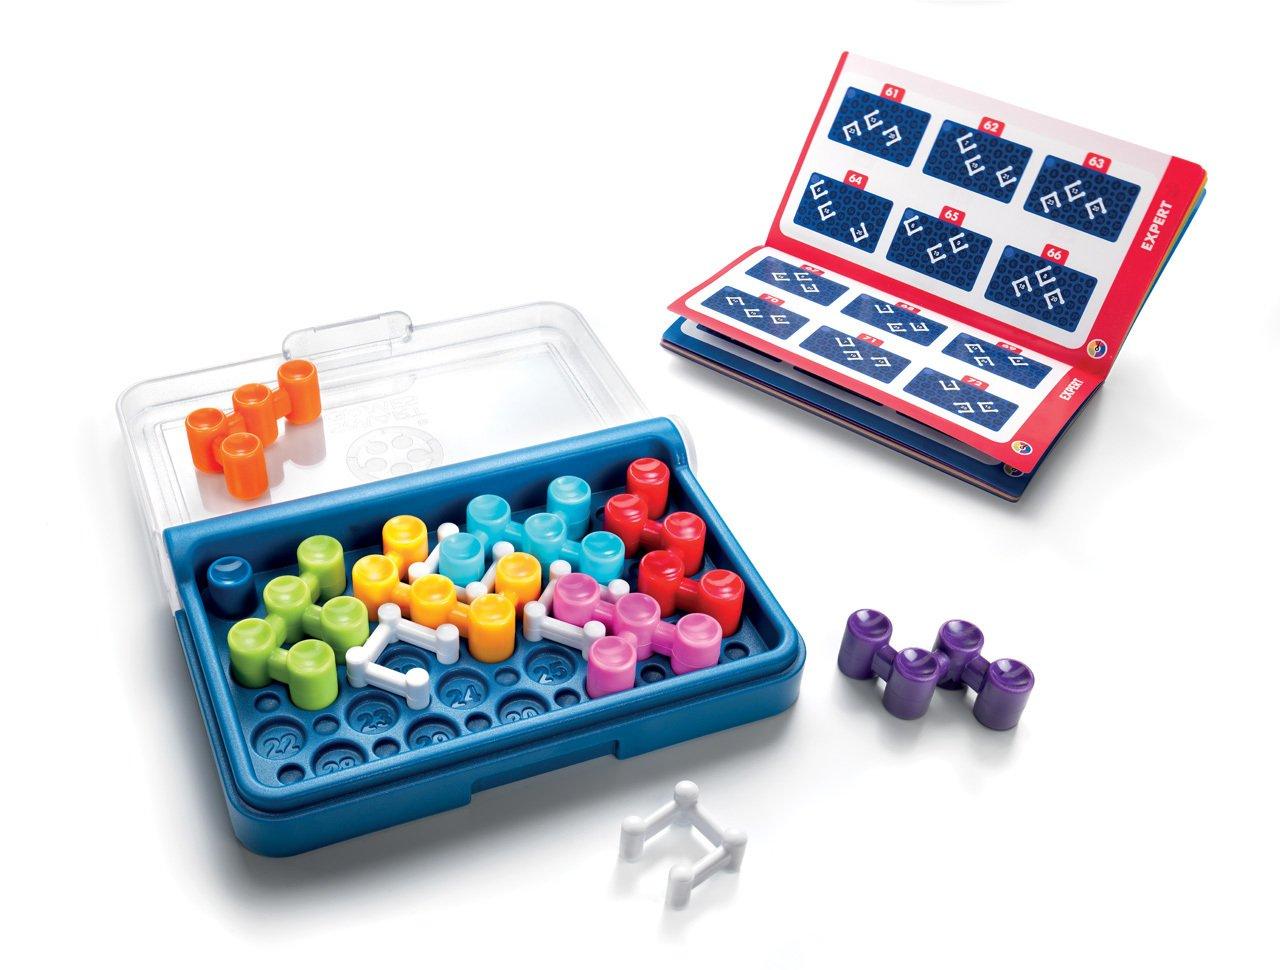 Smart Games IQ Blox Brainteaser Puzzle Game